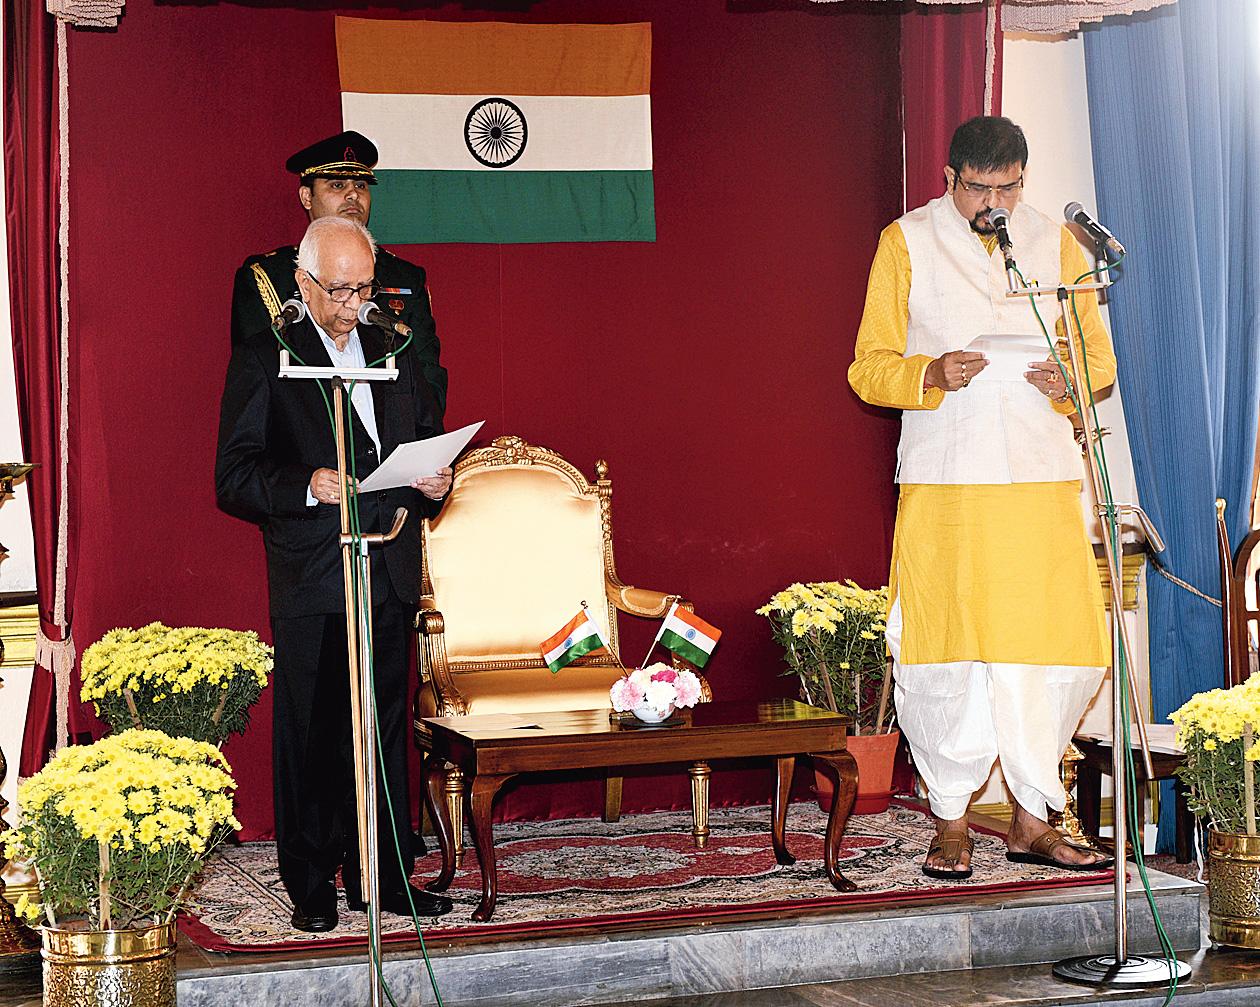 Bidhannagar MLA Sujit Bose was sworn in by Governor K.N. Tripathi at Raj Bhawan on December 20.